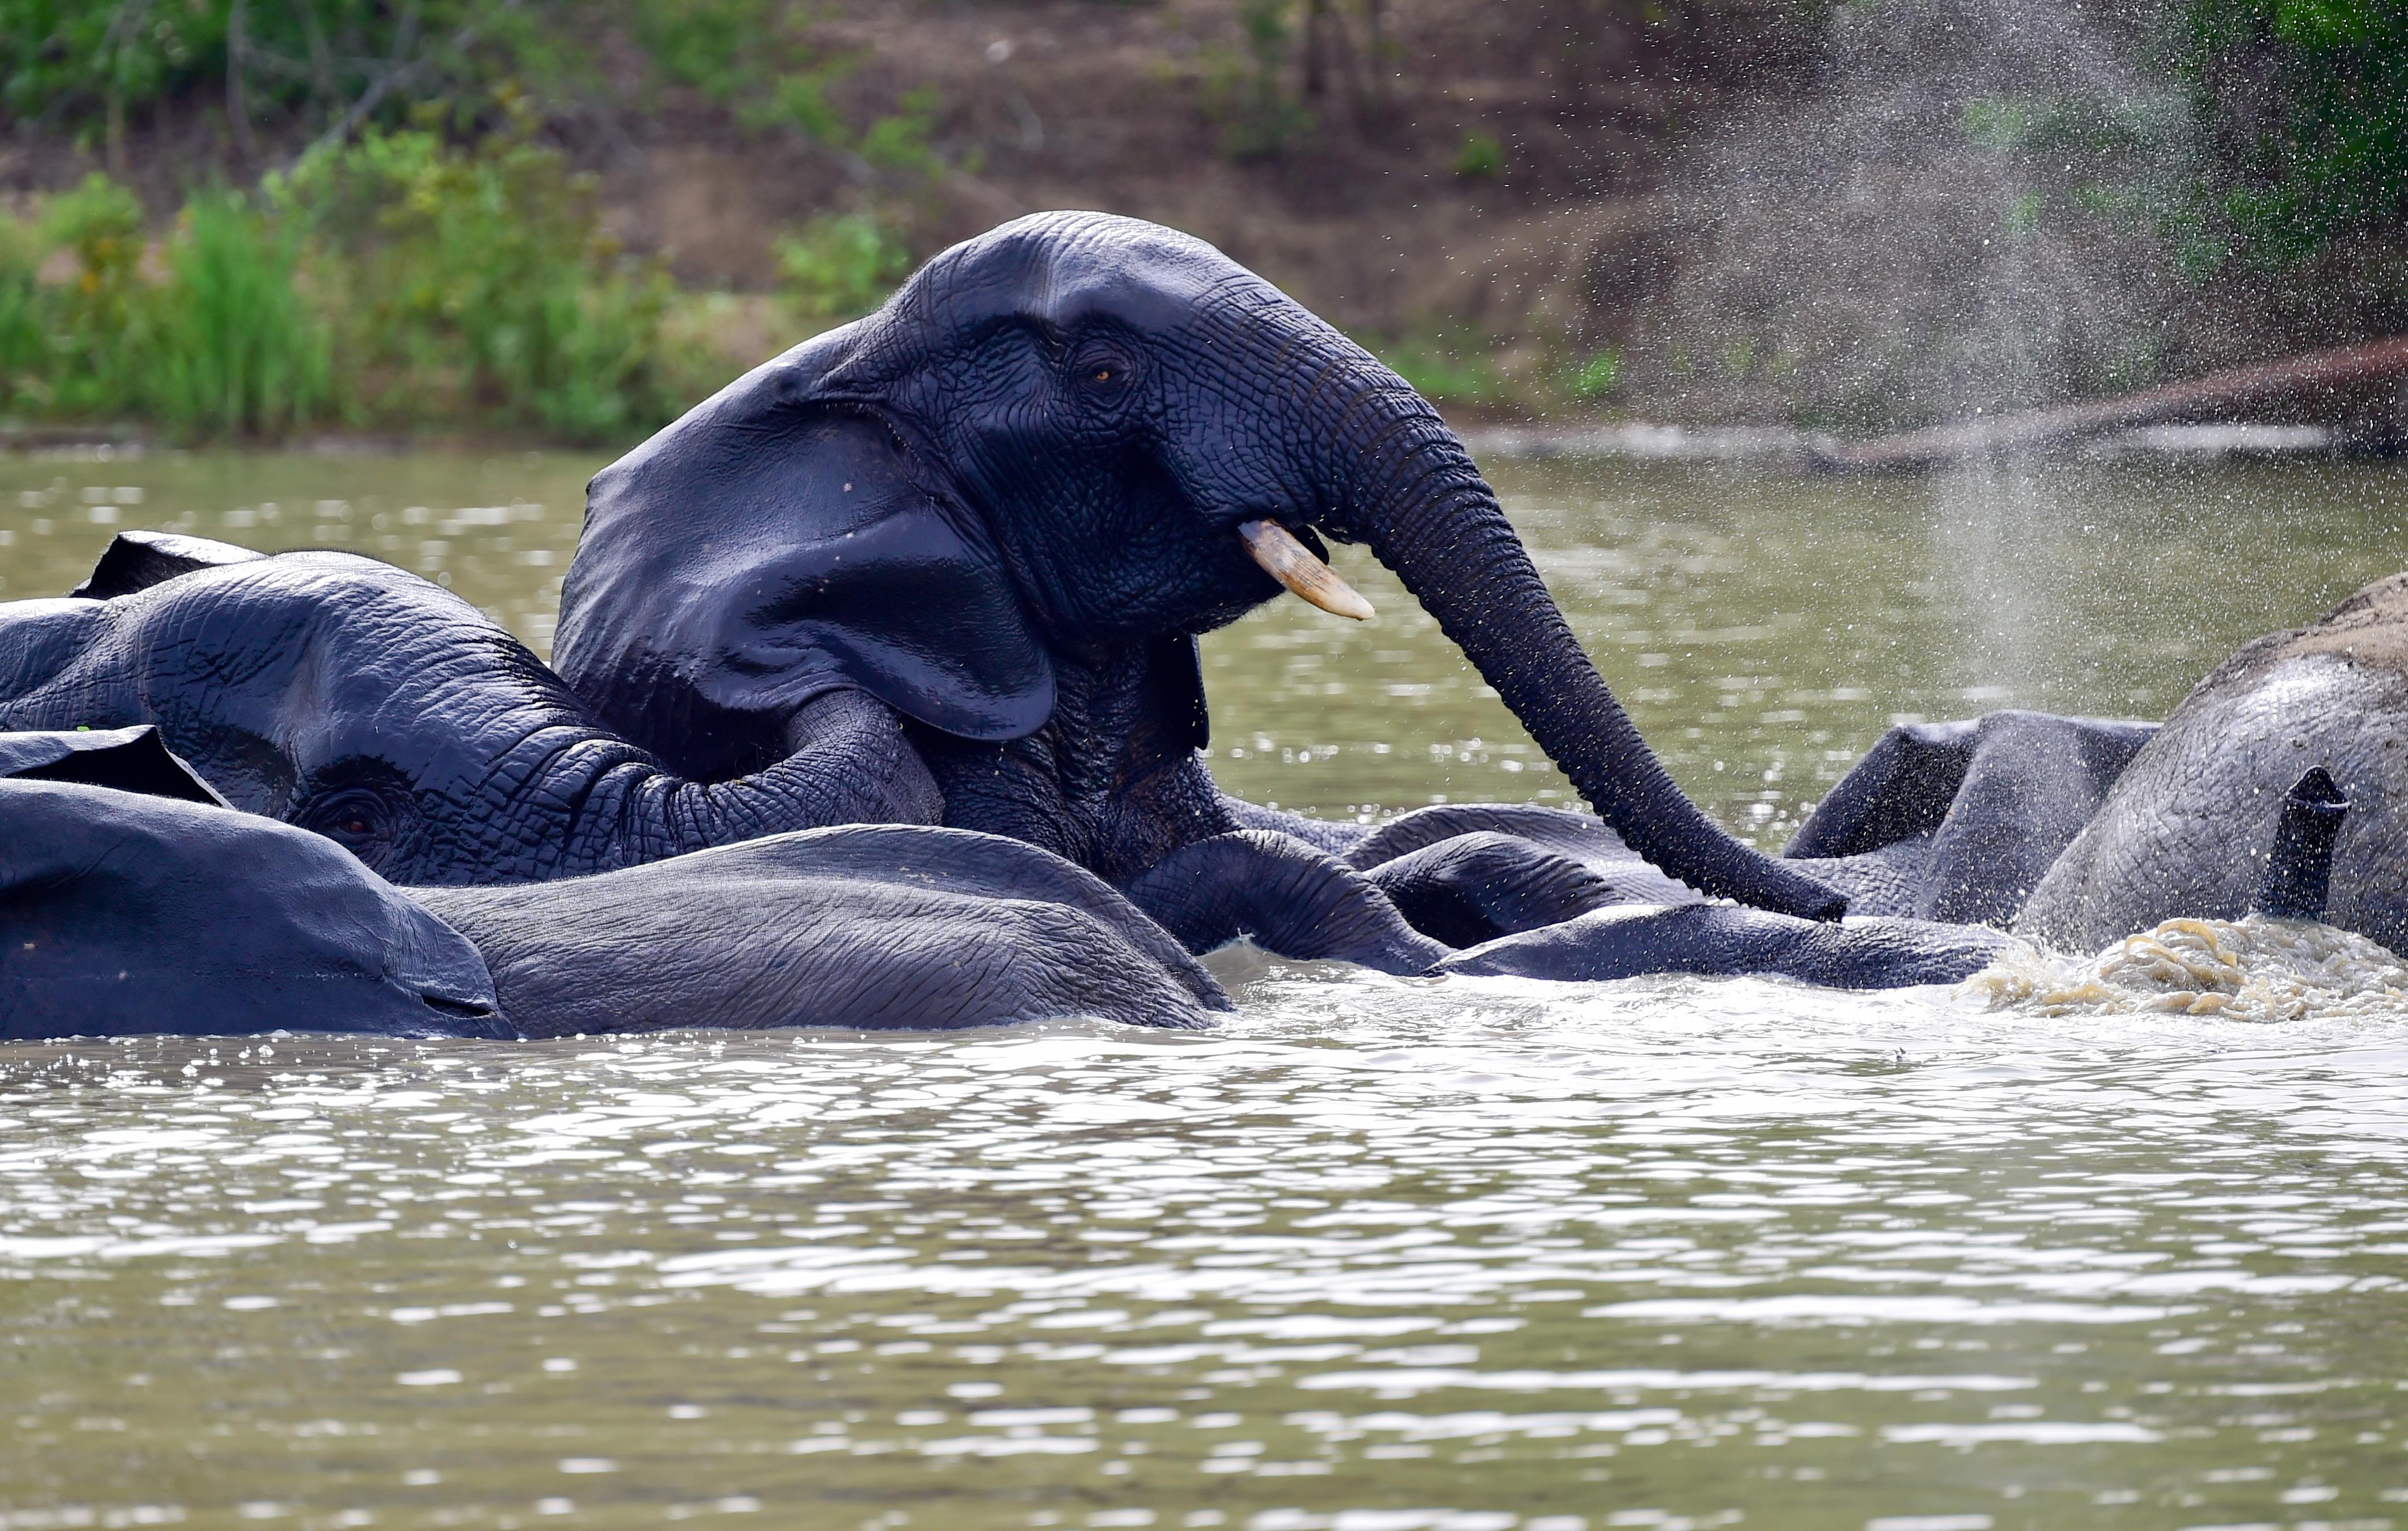 African elephants at the waterhole in Mole National Park in Ghana